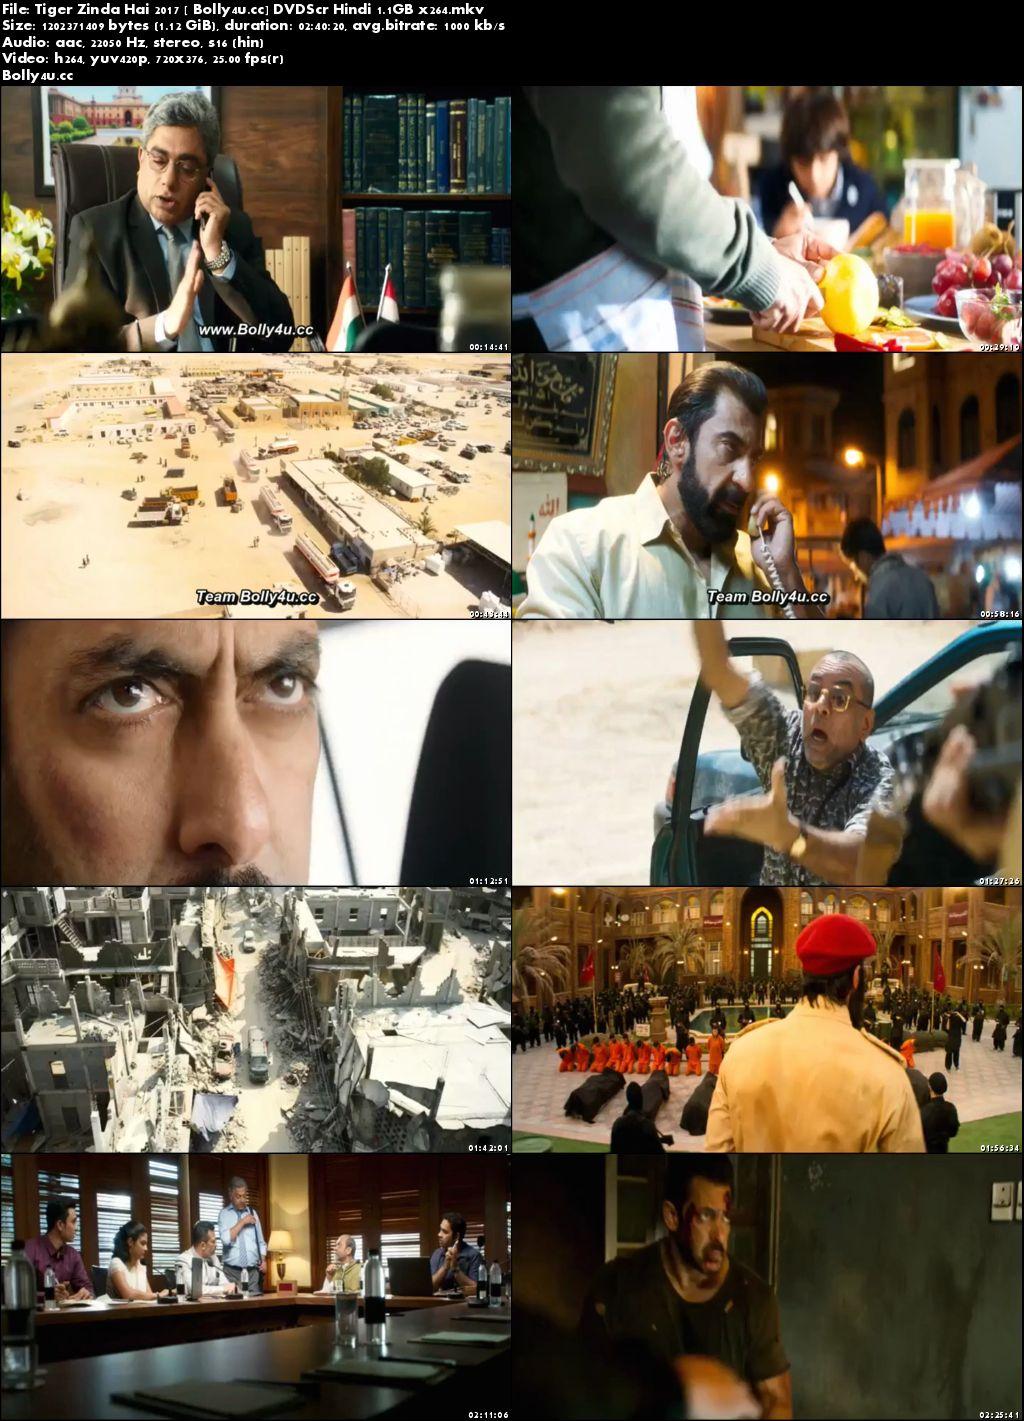 Tiger Zinda Hai 2017 DVDScr  450MB Full Hindi Movie Download 480p